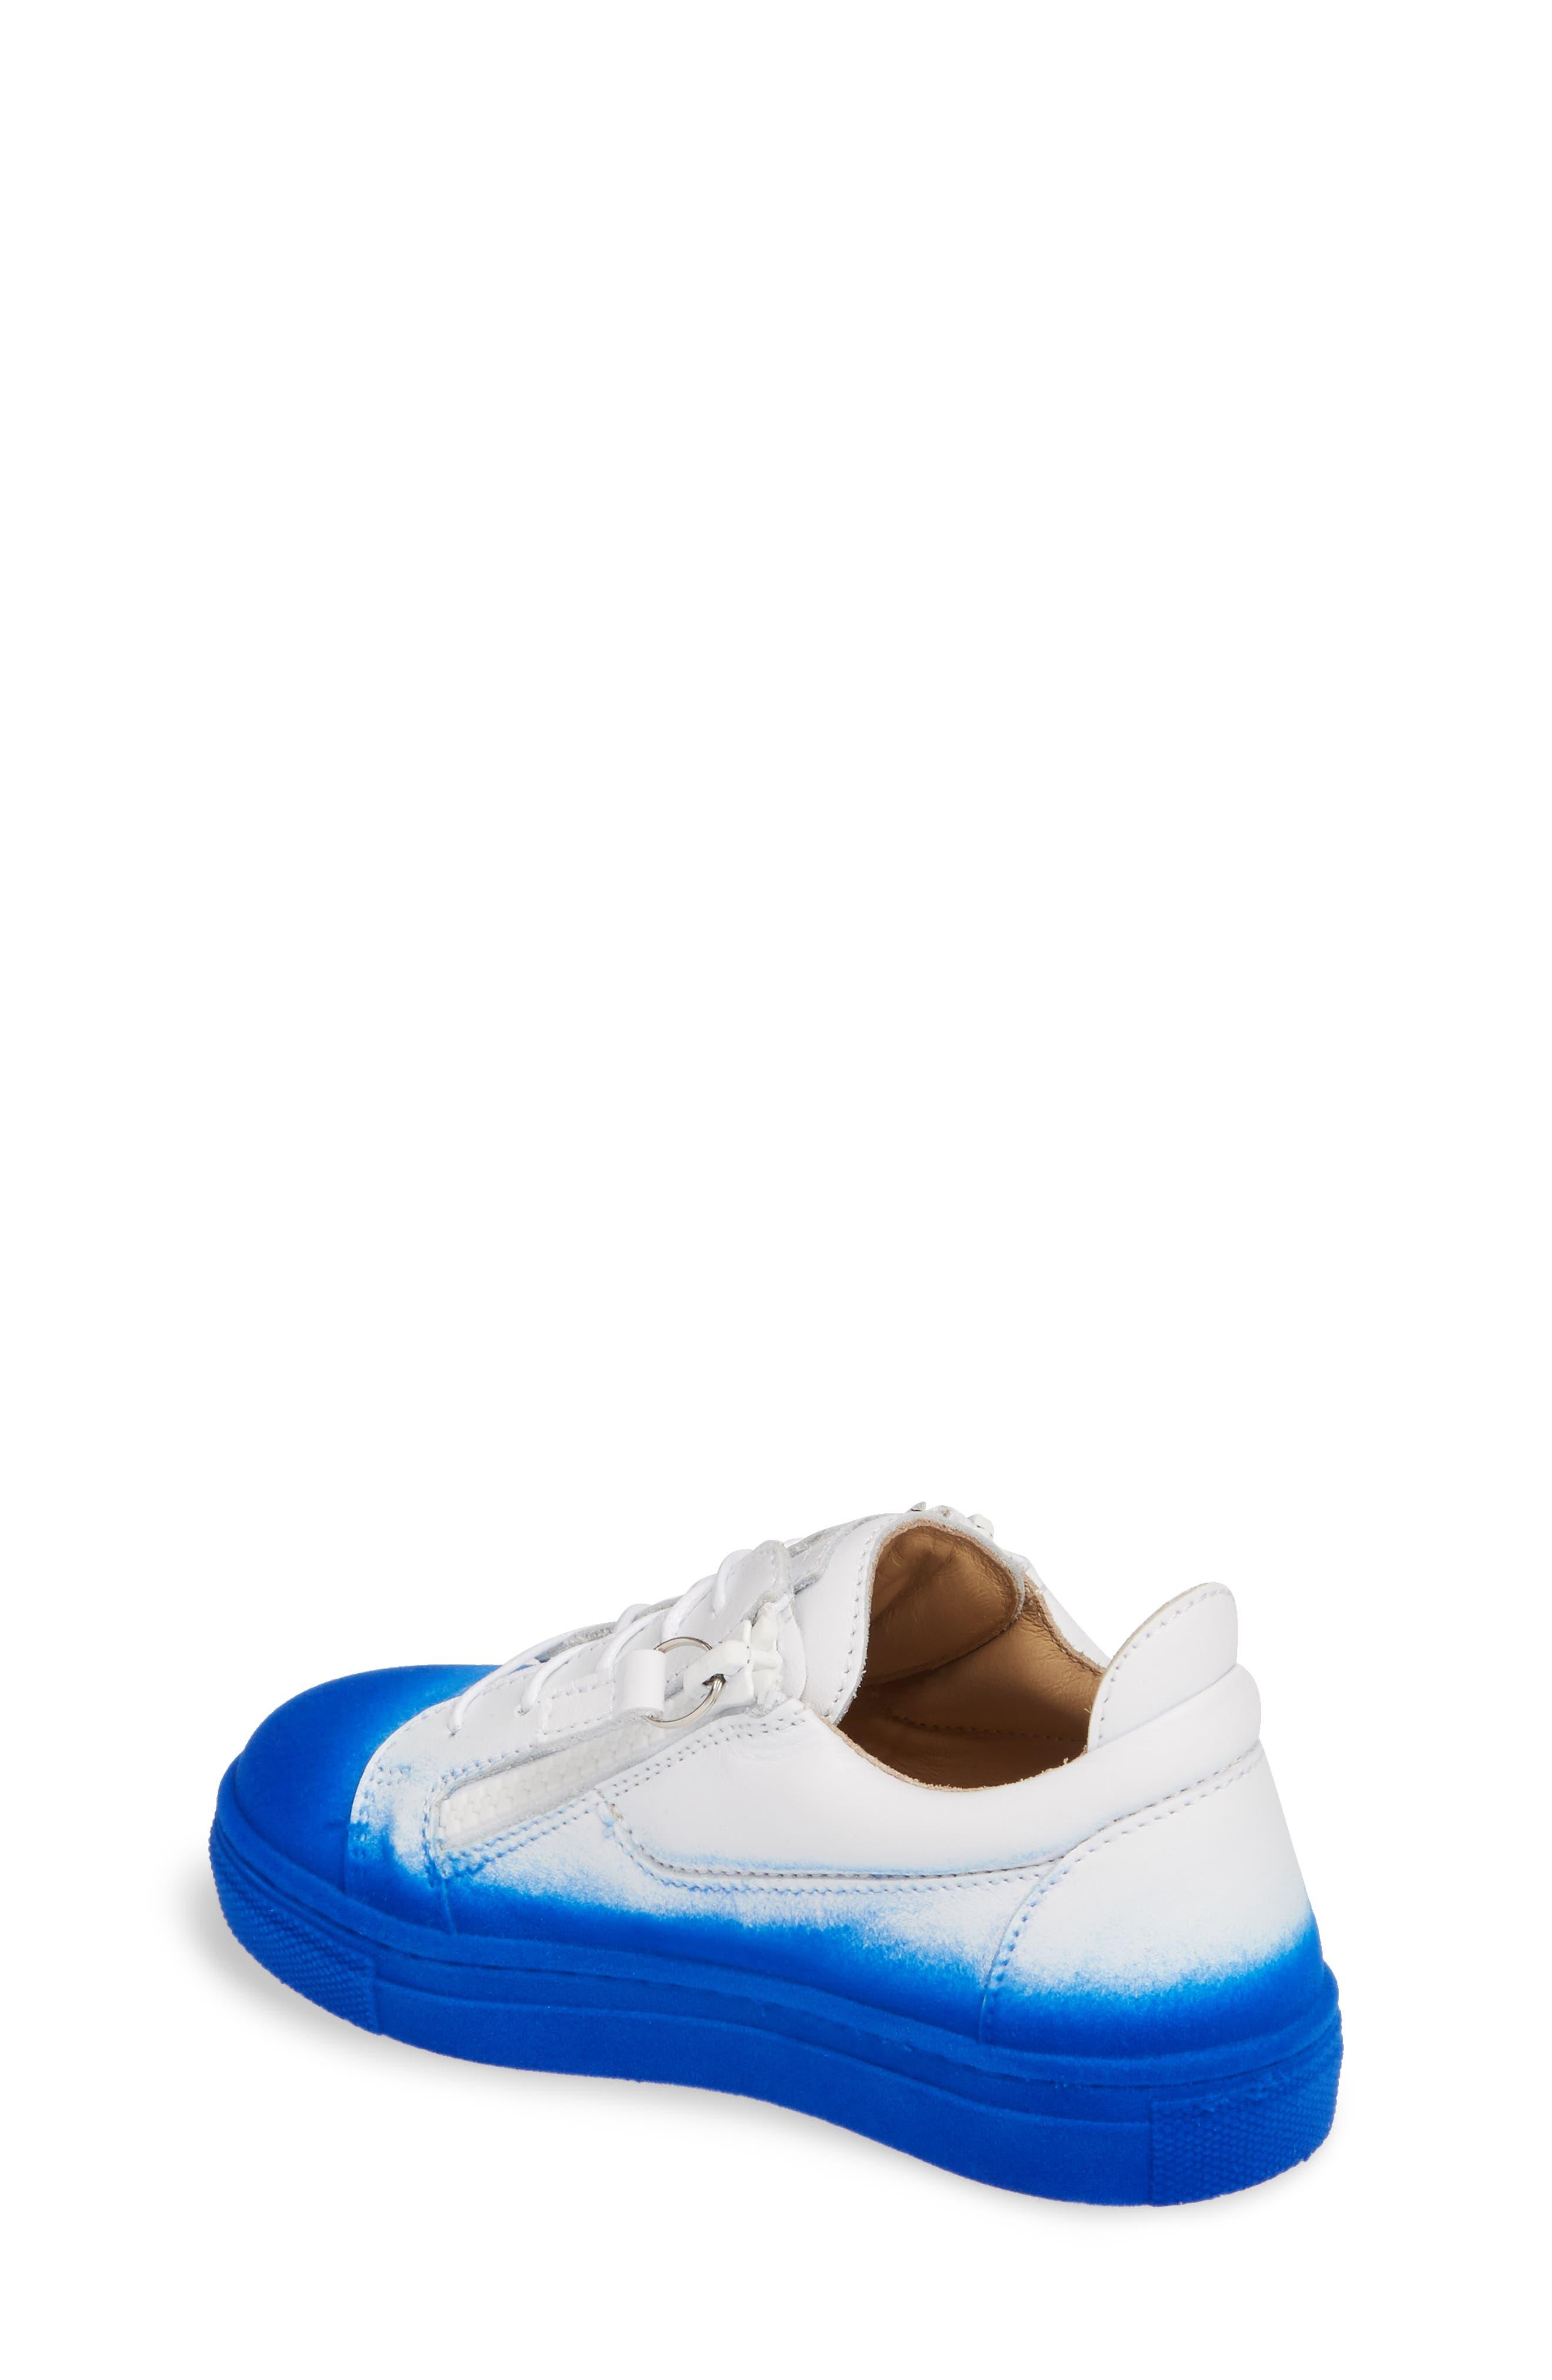 Smuggy Ombré Flocked Sneaker,                             Alternate thumbnail 2, color,                             BLUE/ WHITE